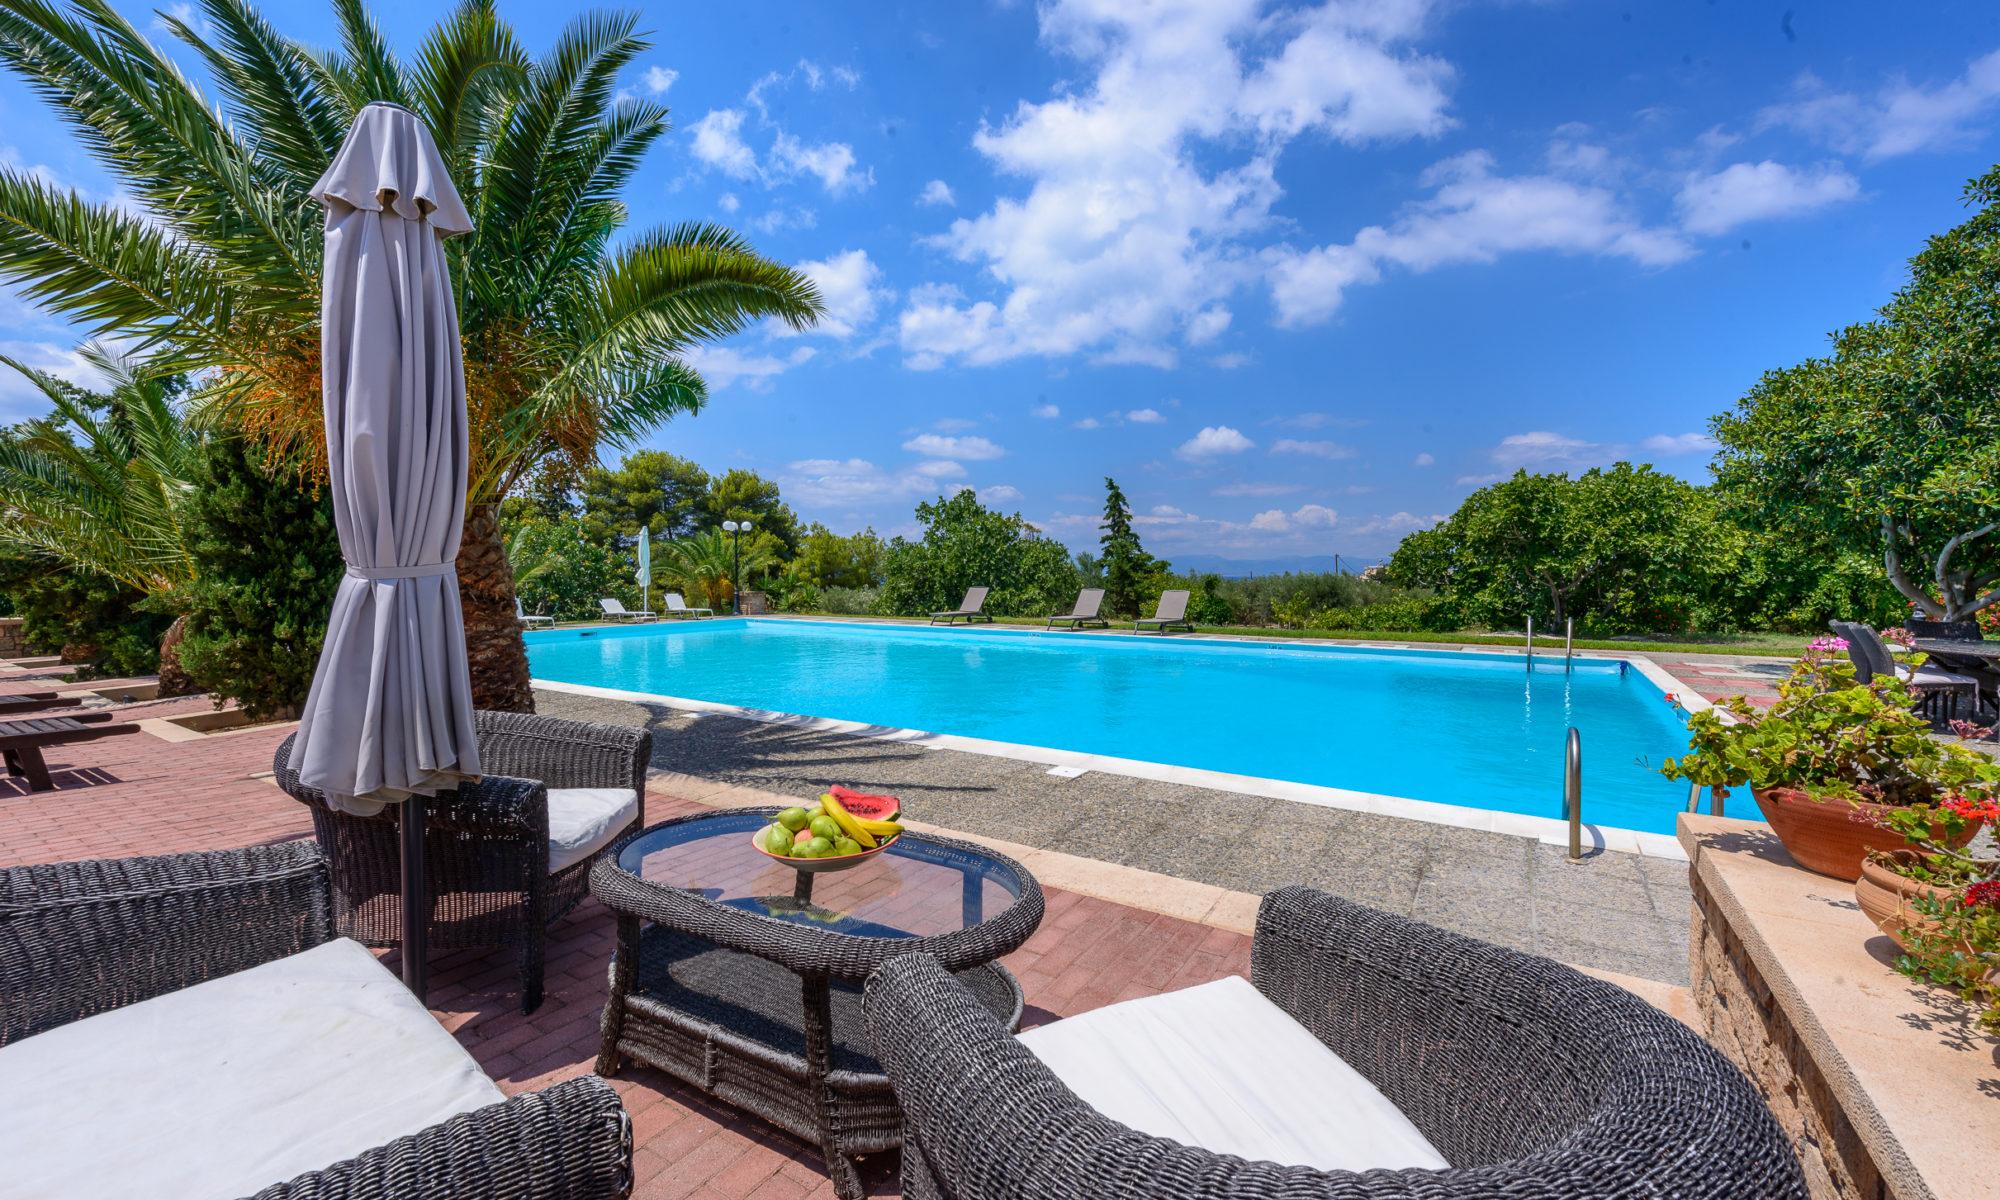 la piscine du domaine à Egine